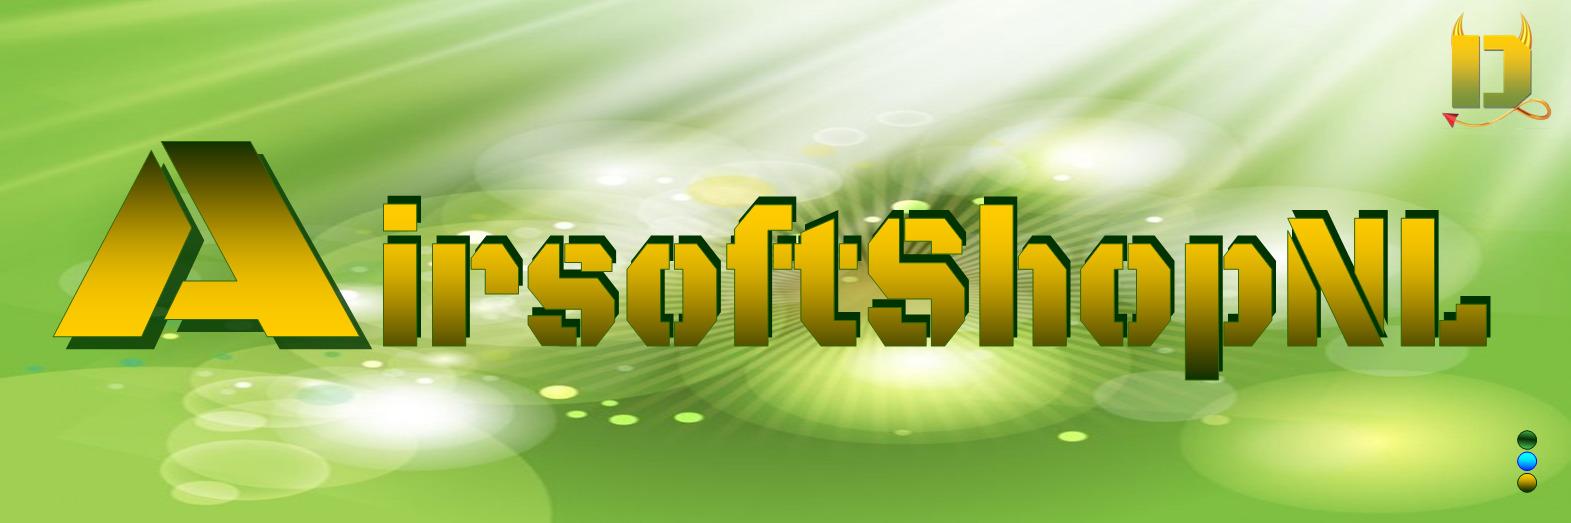 AirsoftShopNL Onze webwinkel